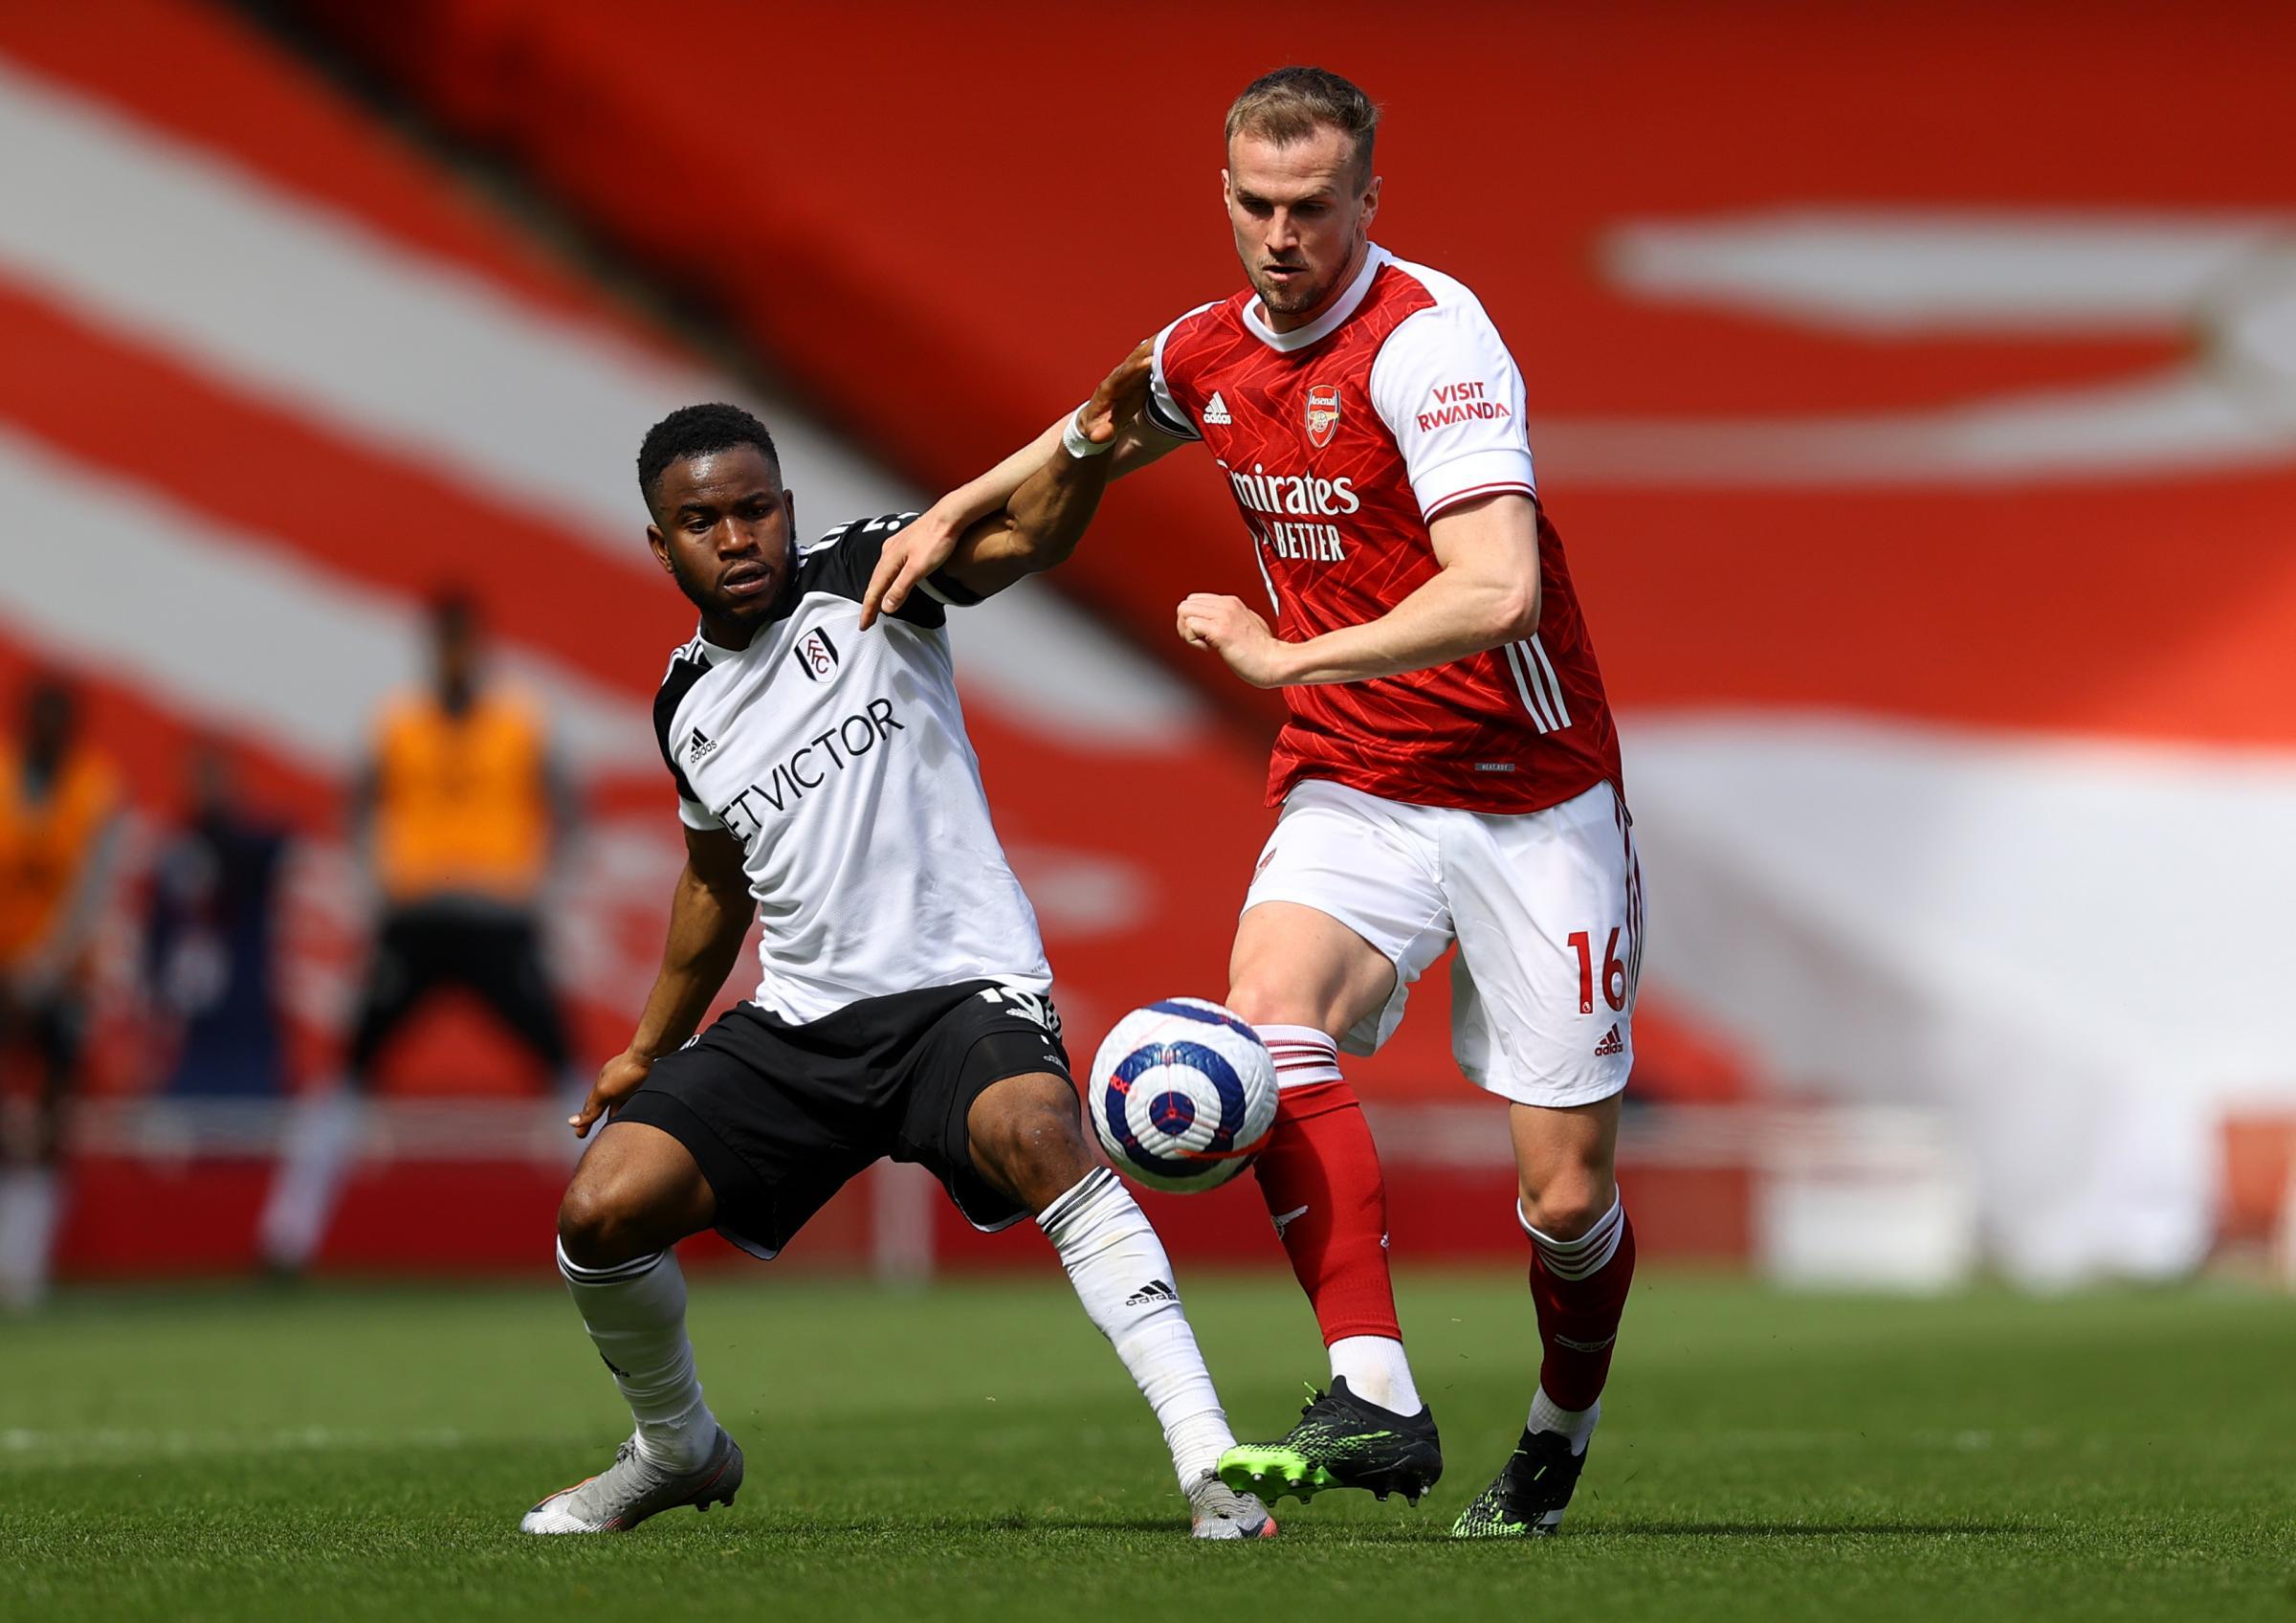 Bolton Wanderers' cash bonus if Newcastle United target Rob Holding left Arsenal